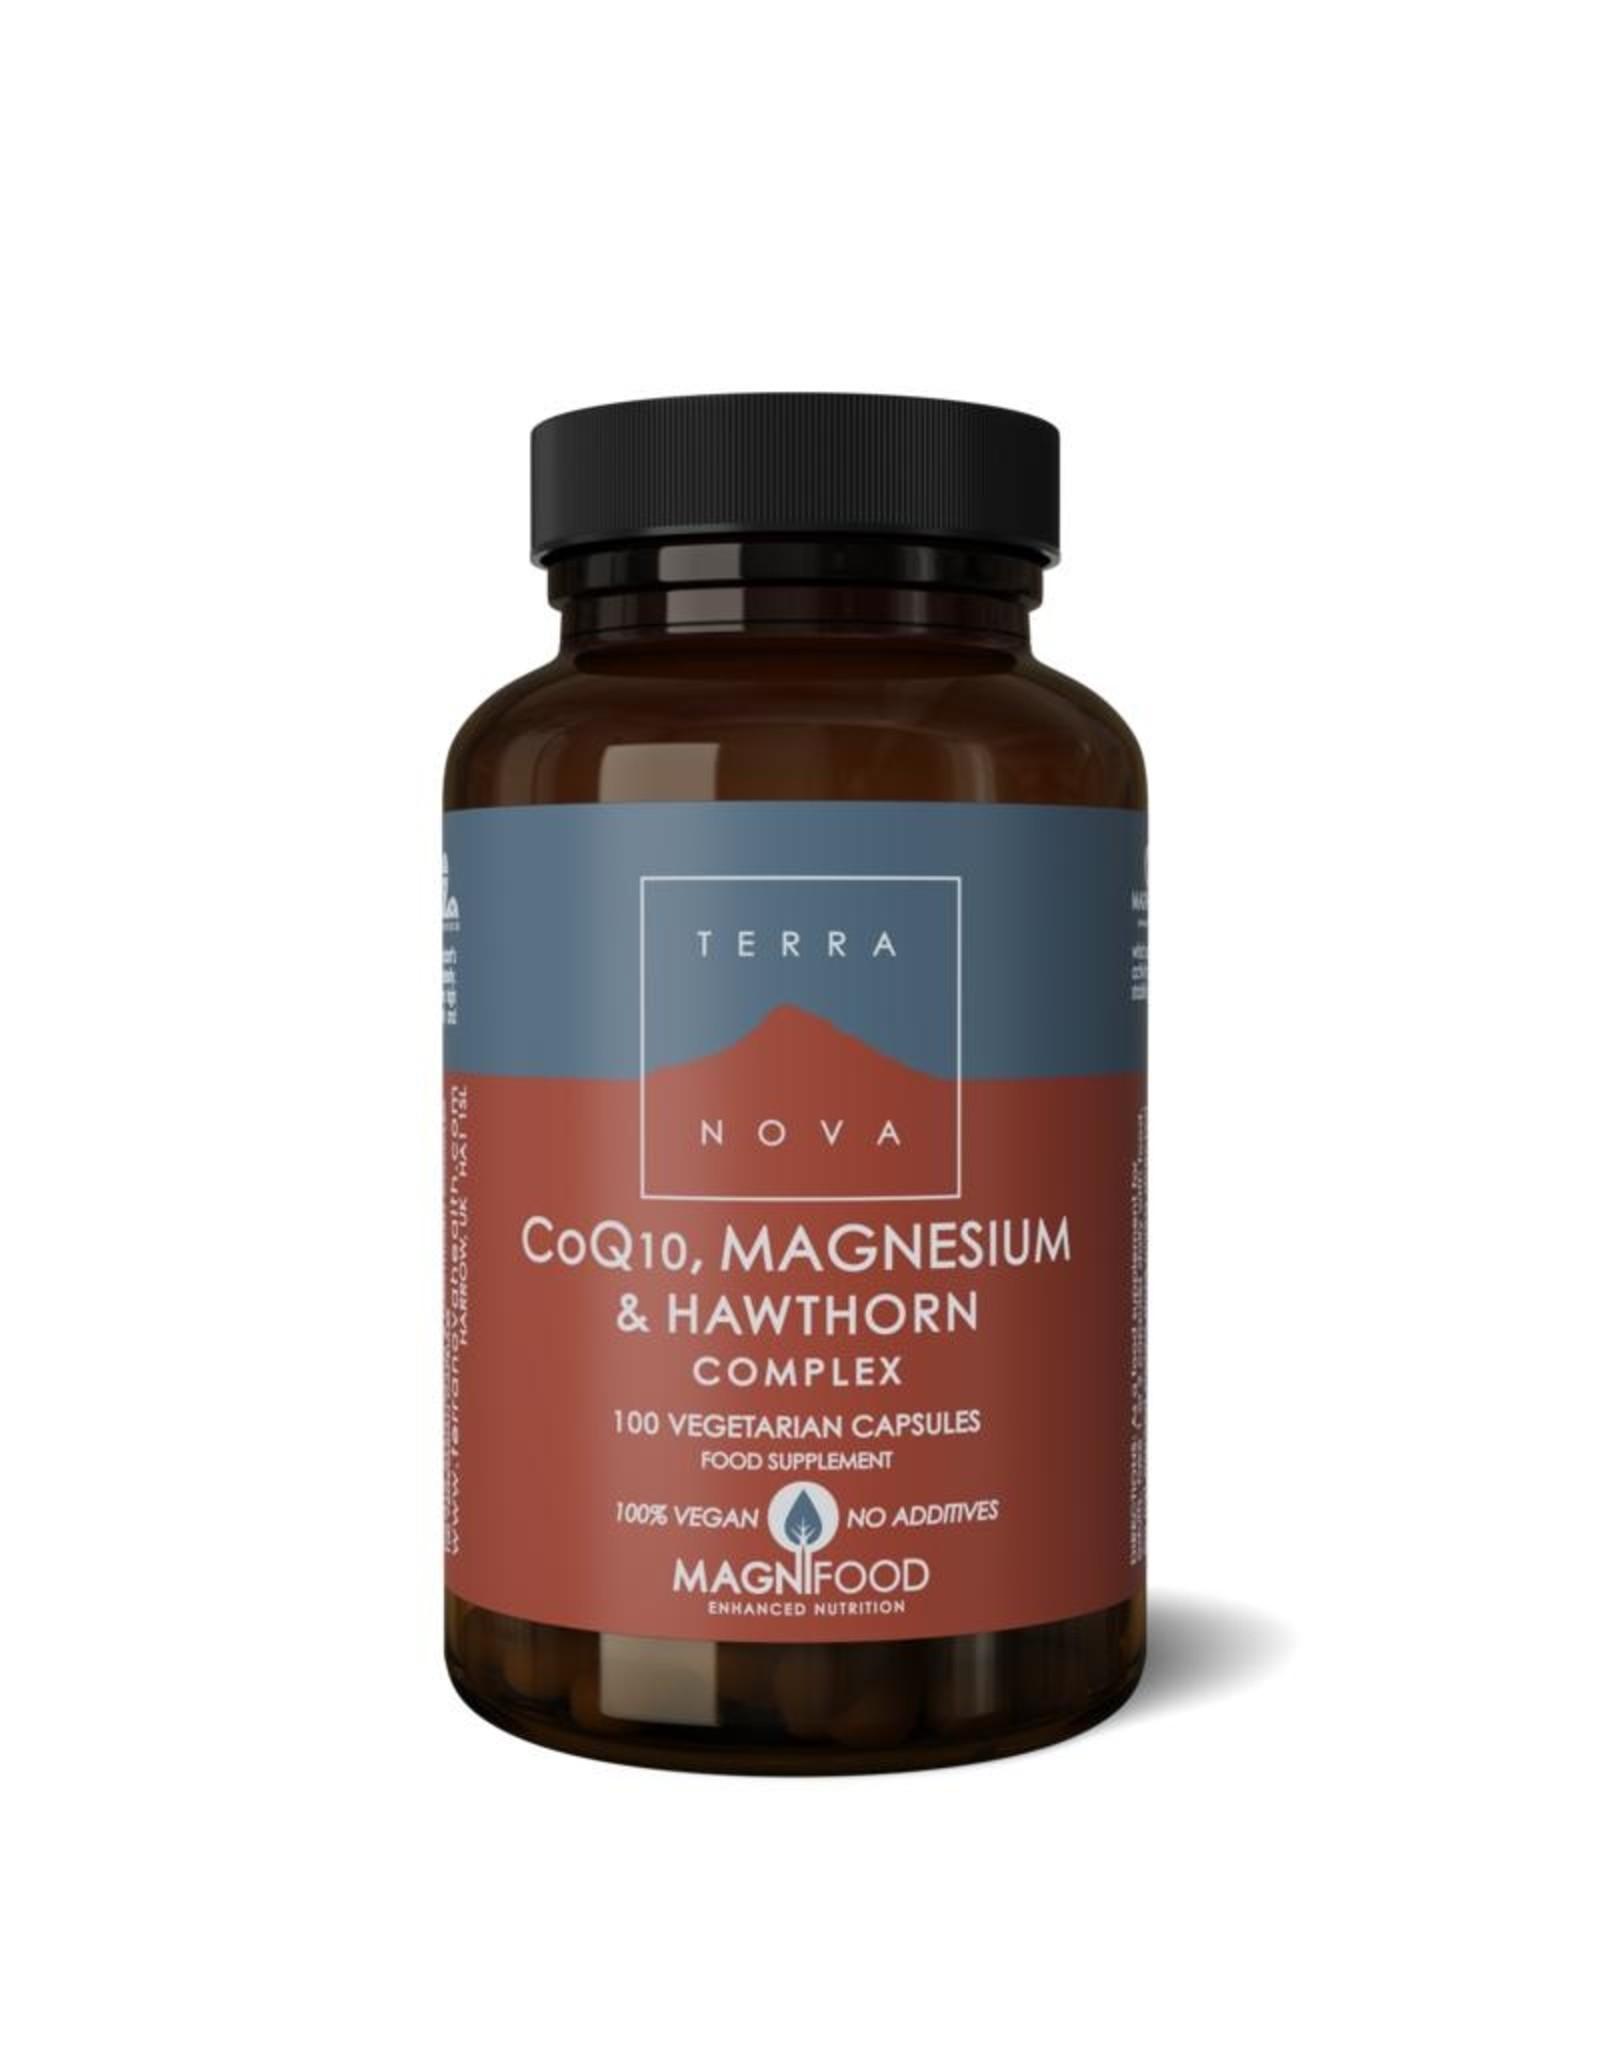 Terranova CoQ10, Magnesium & Hawthorn Complex | 50 / 100 Caps